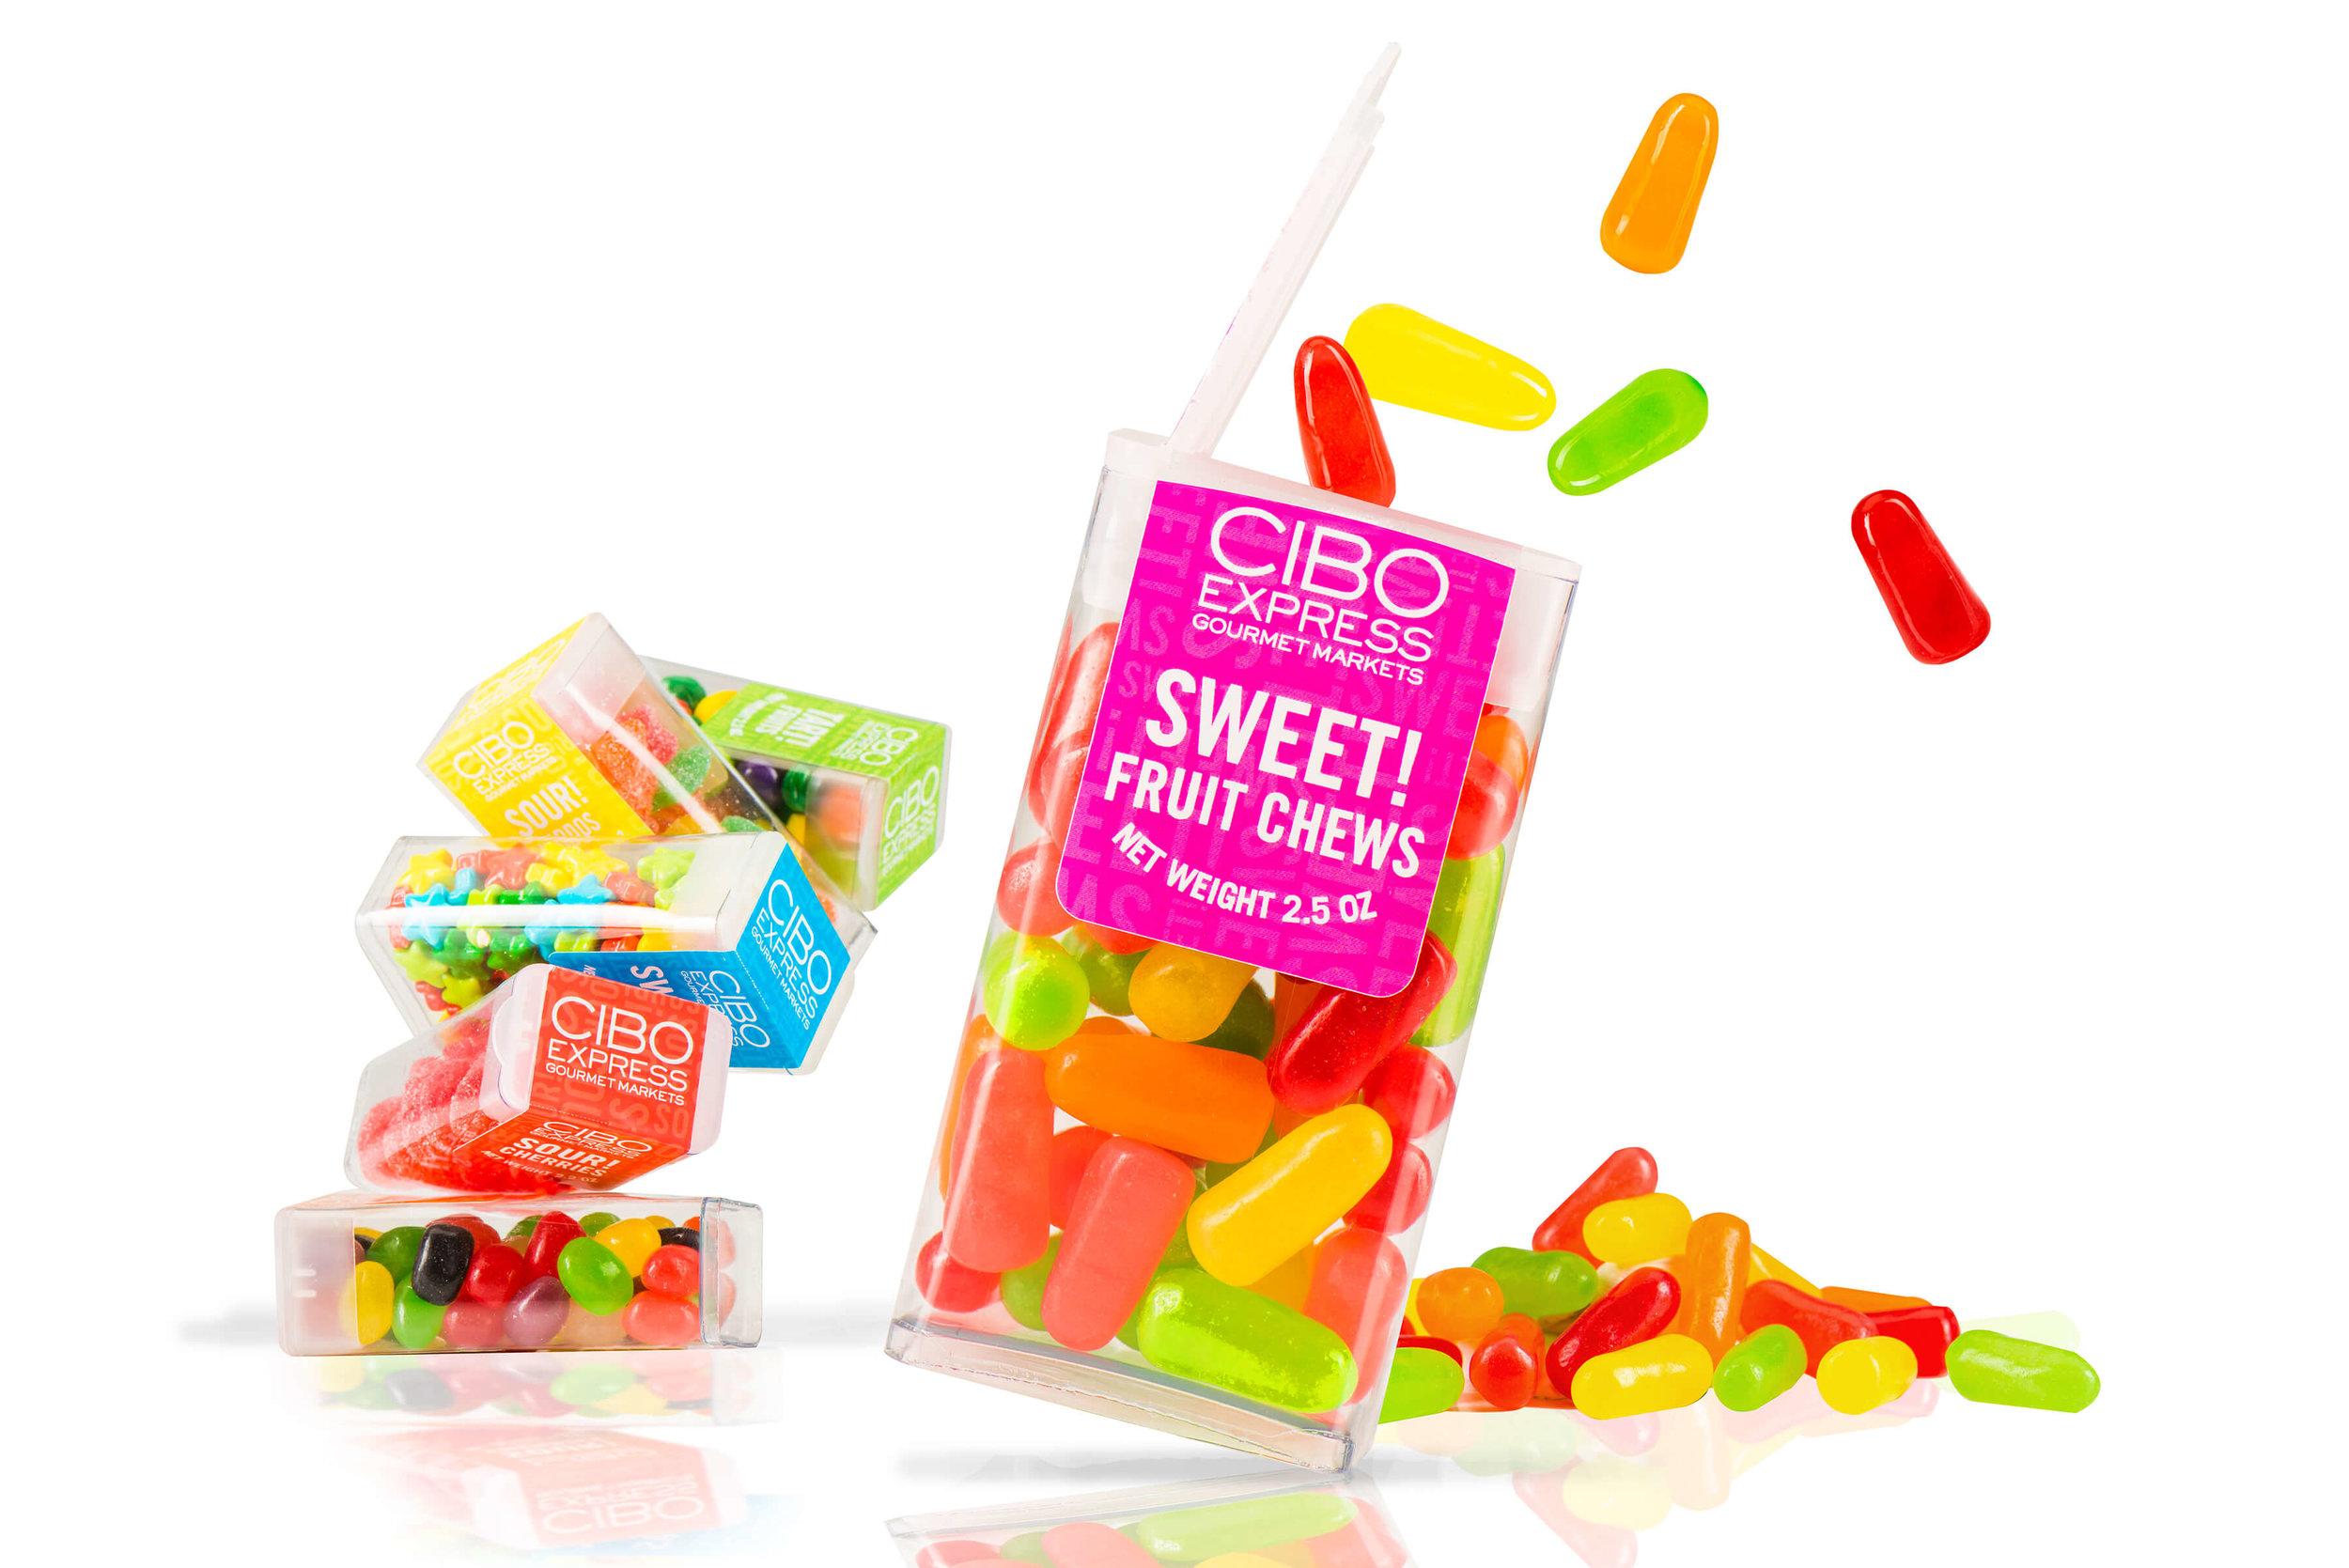 Candy Cibo (1).jpg